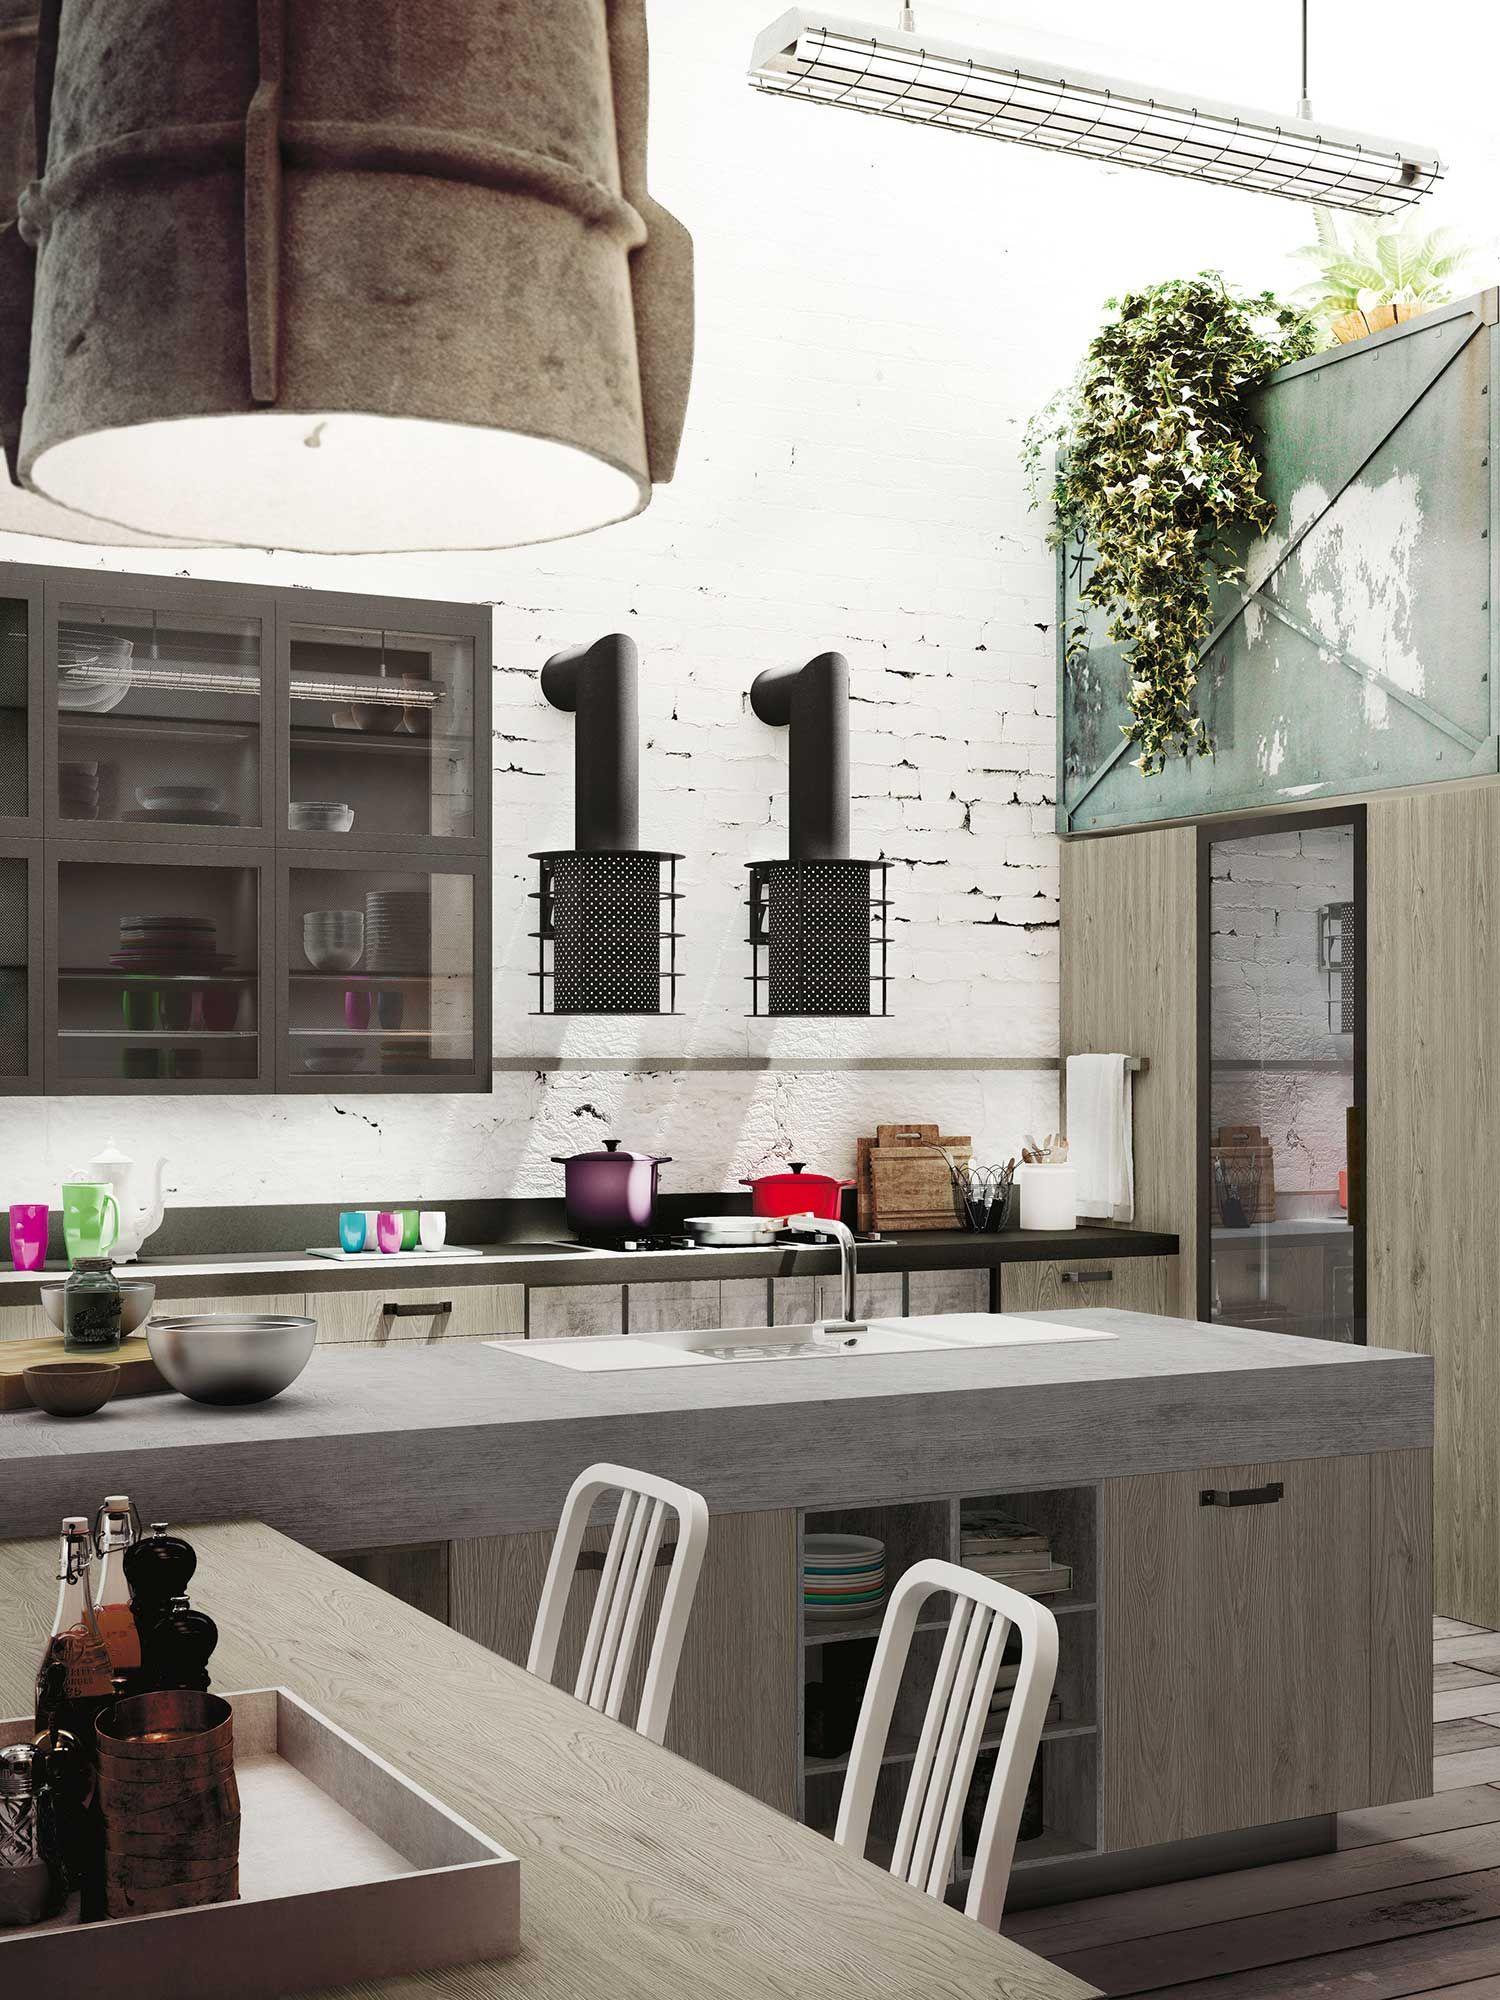 Expression Of The Latest Urban Trends Loft Kitchen Loft